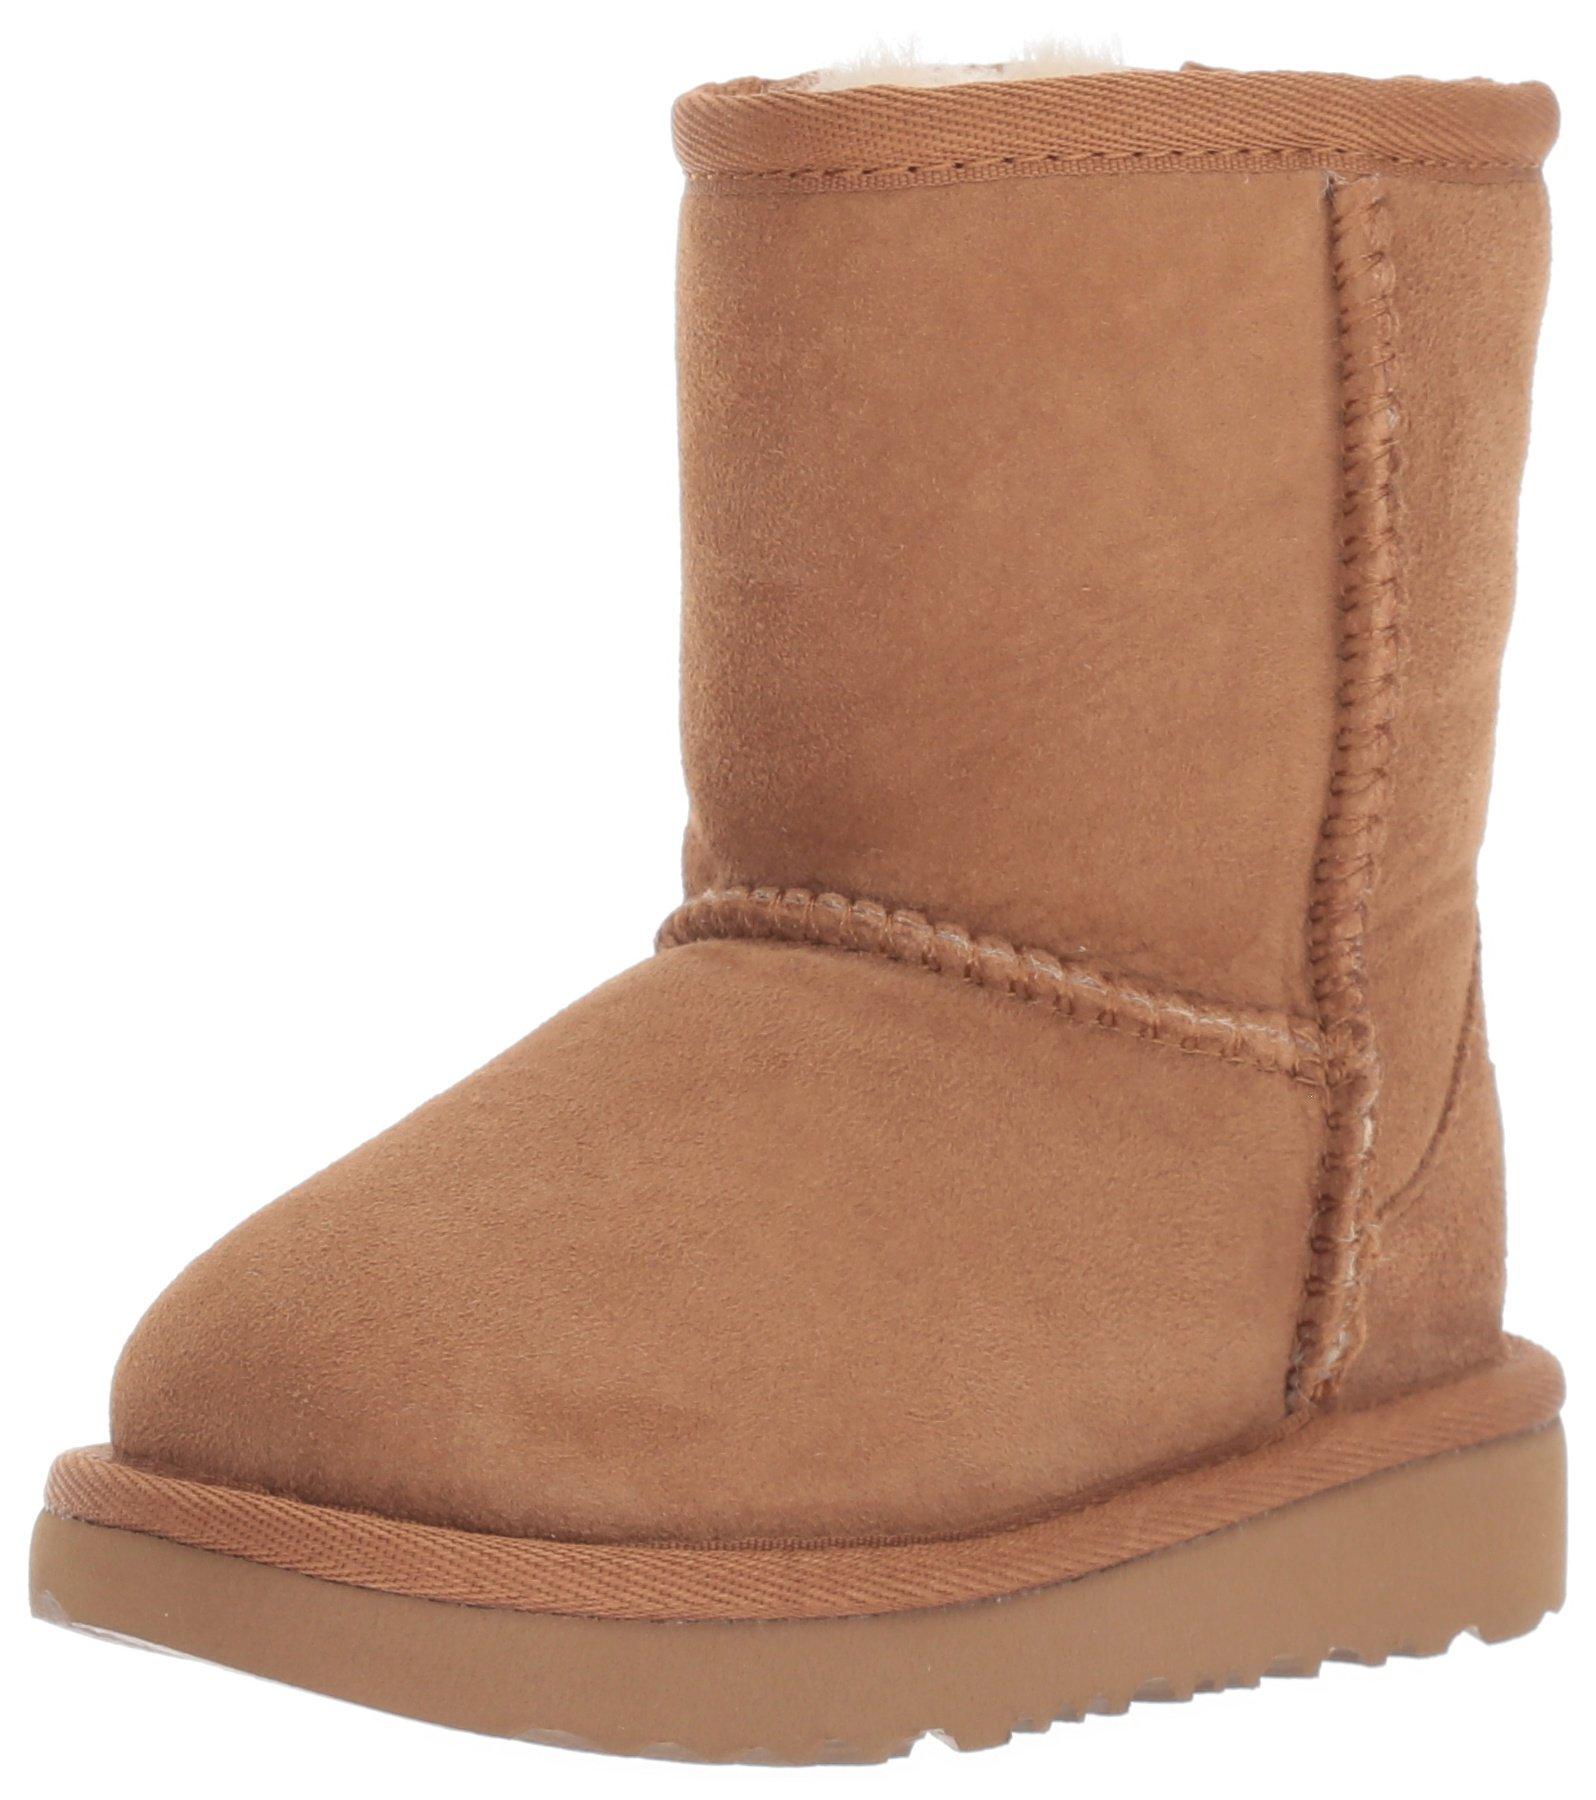 UGG Kids K Classic II Fashion Boot, Chestnut, 5 M US Big Kid by UGG